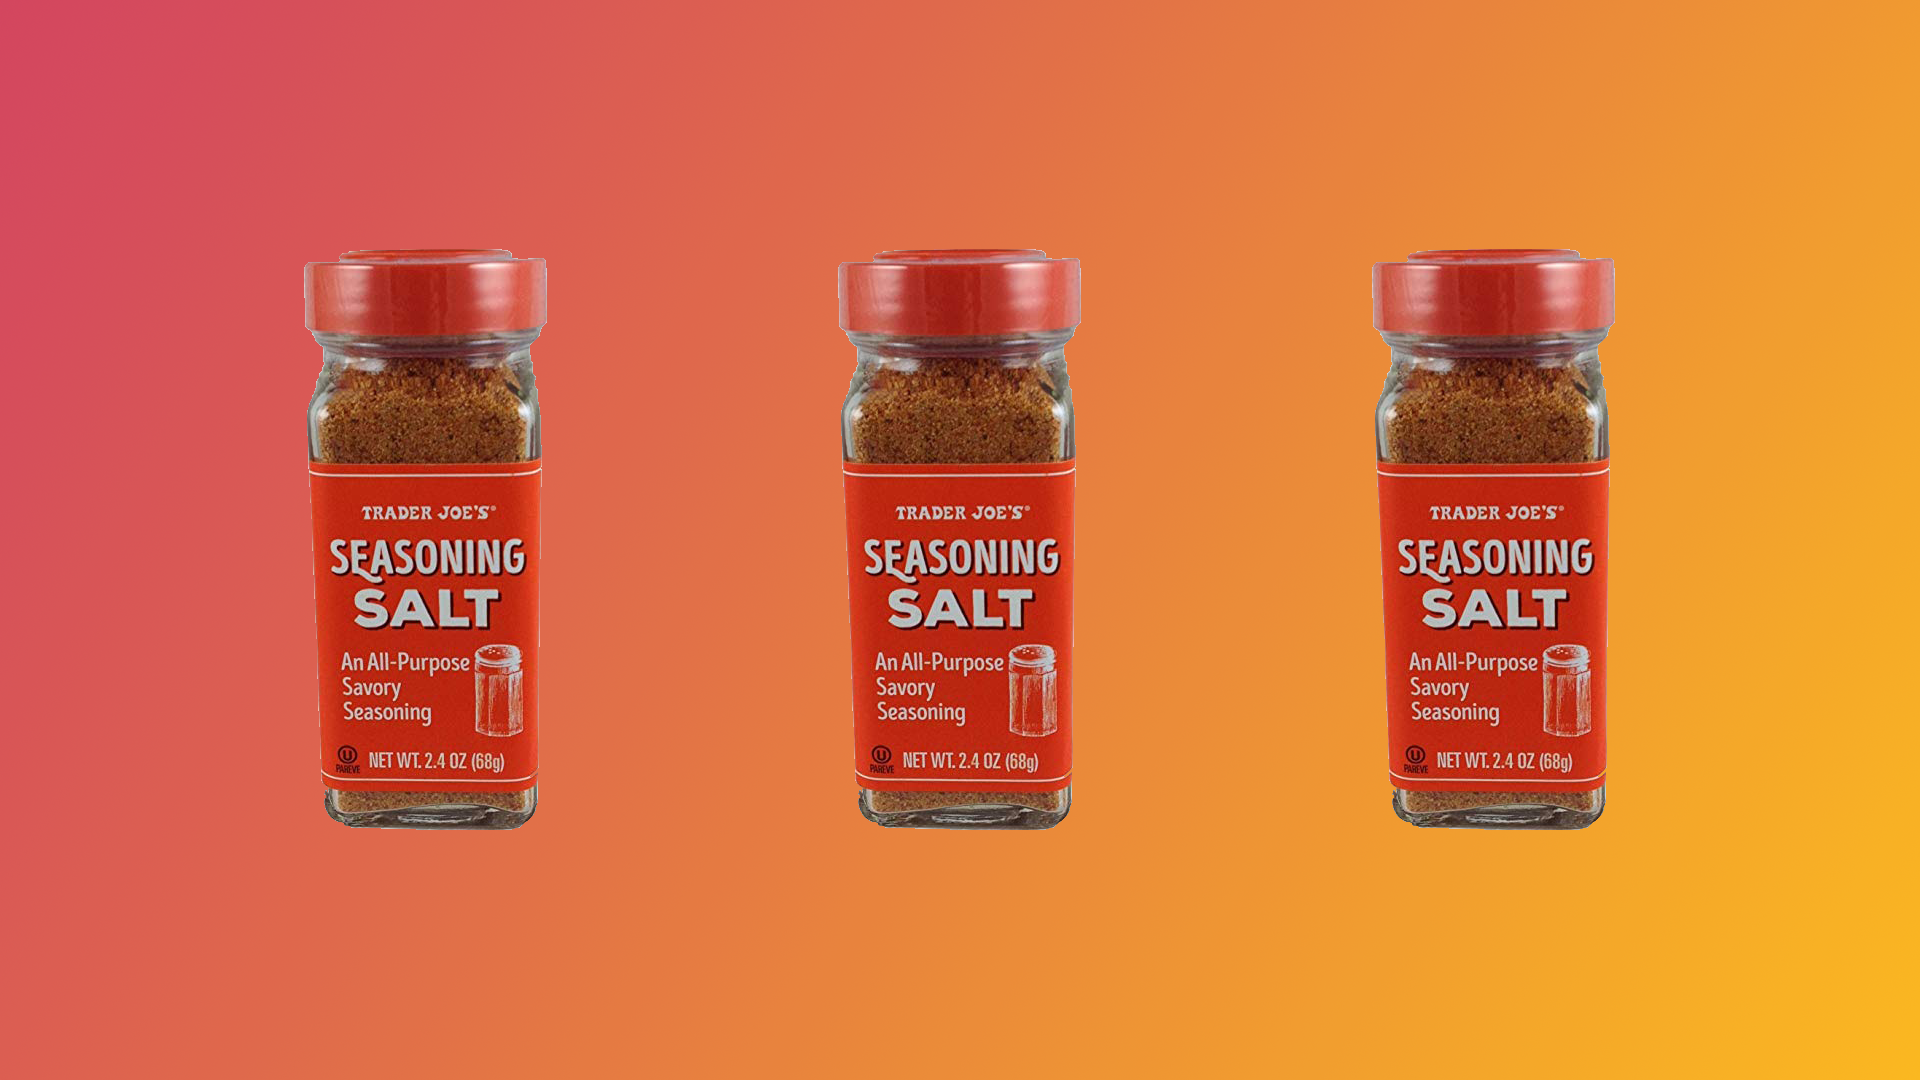 Trader Joe's Seasoning Salt Image